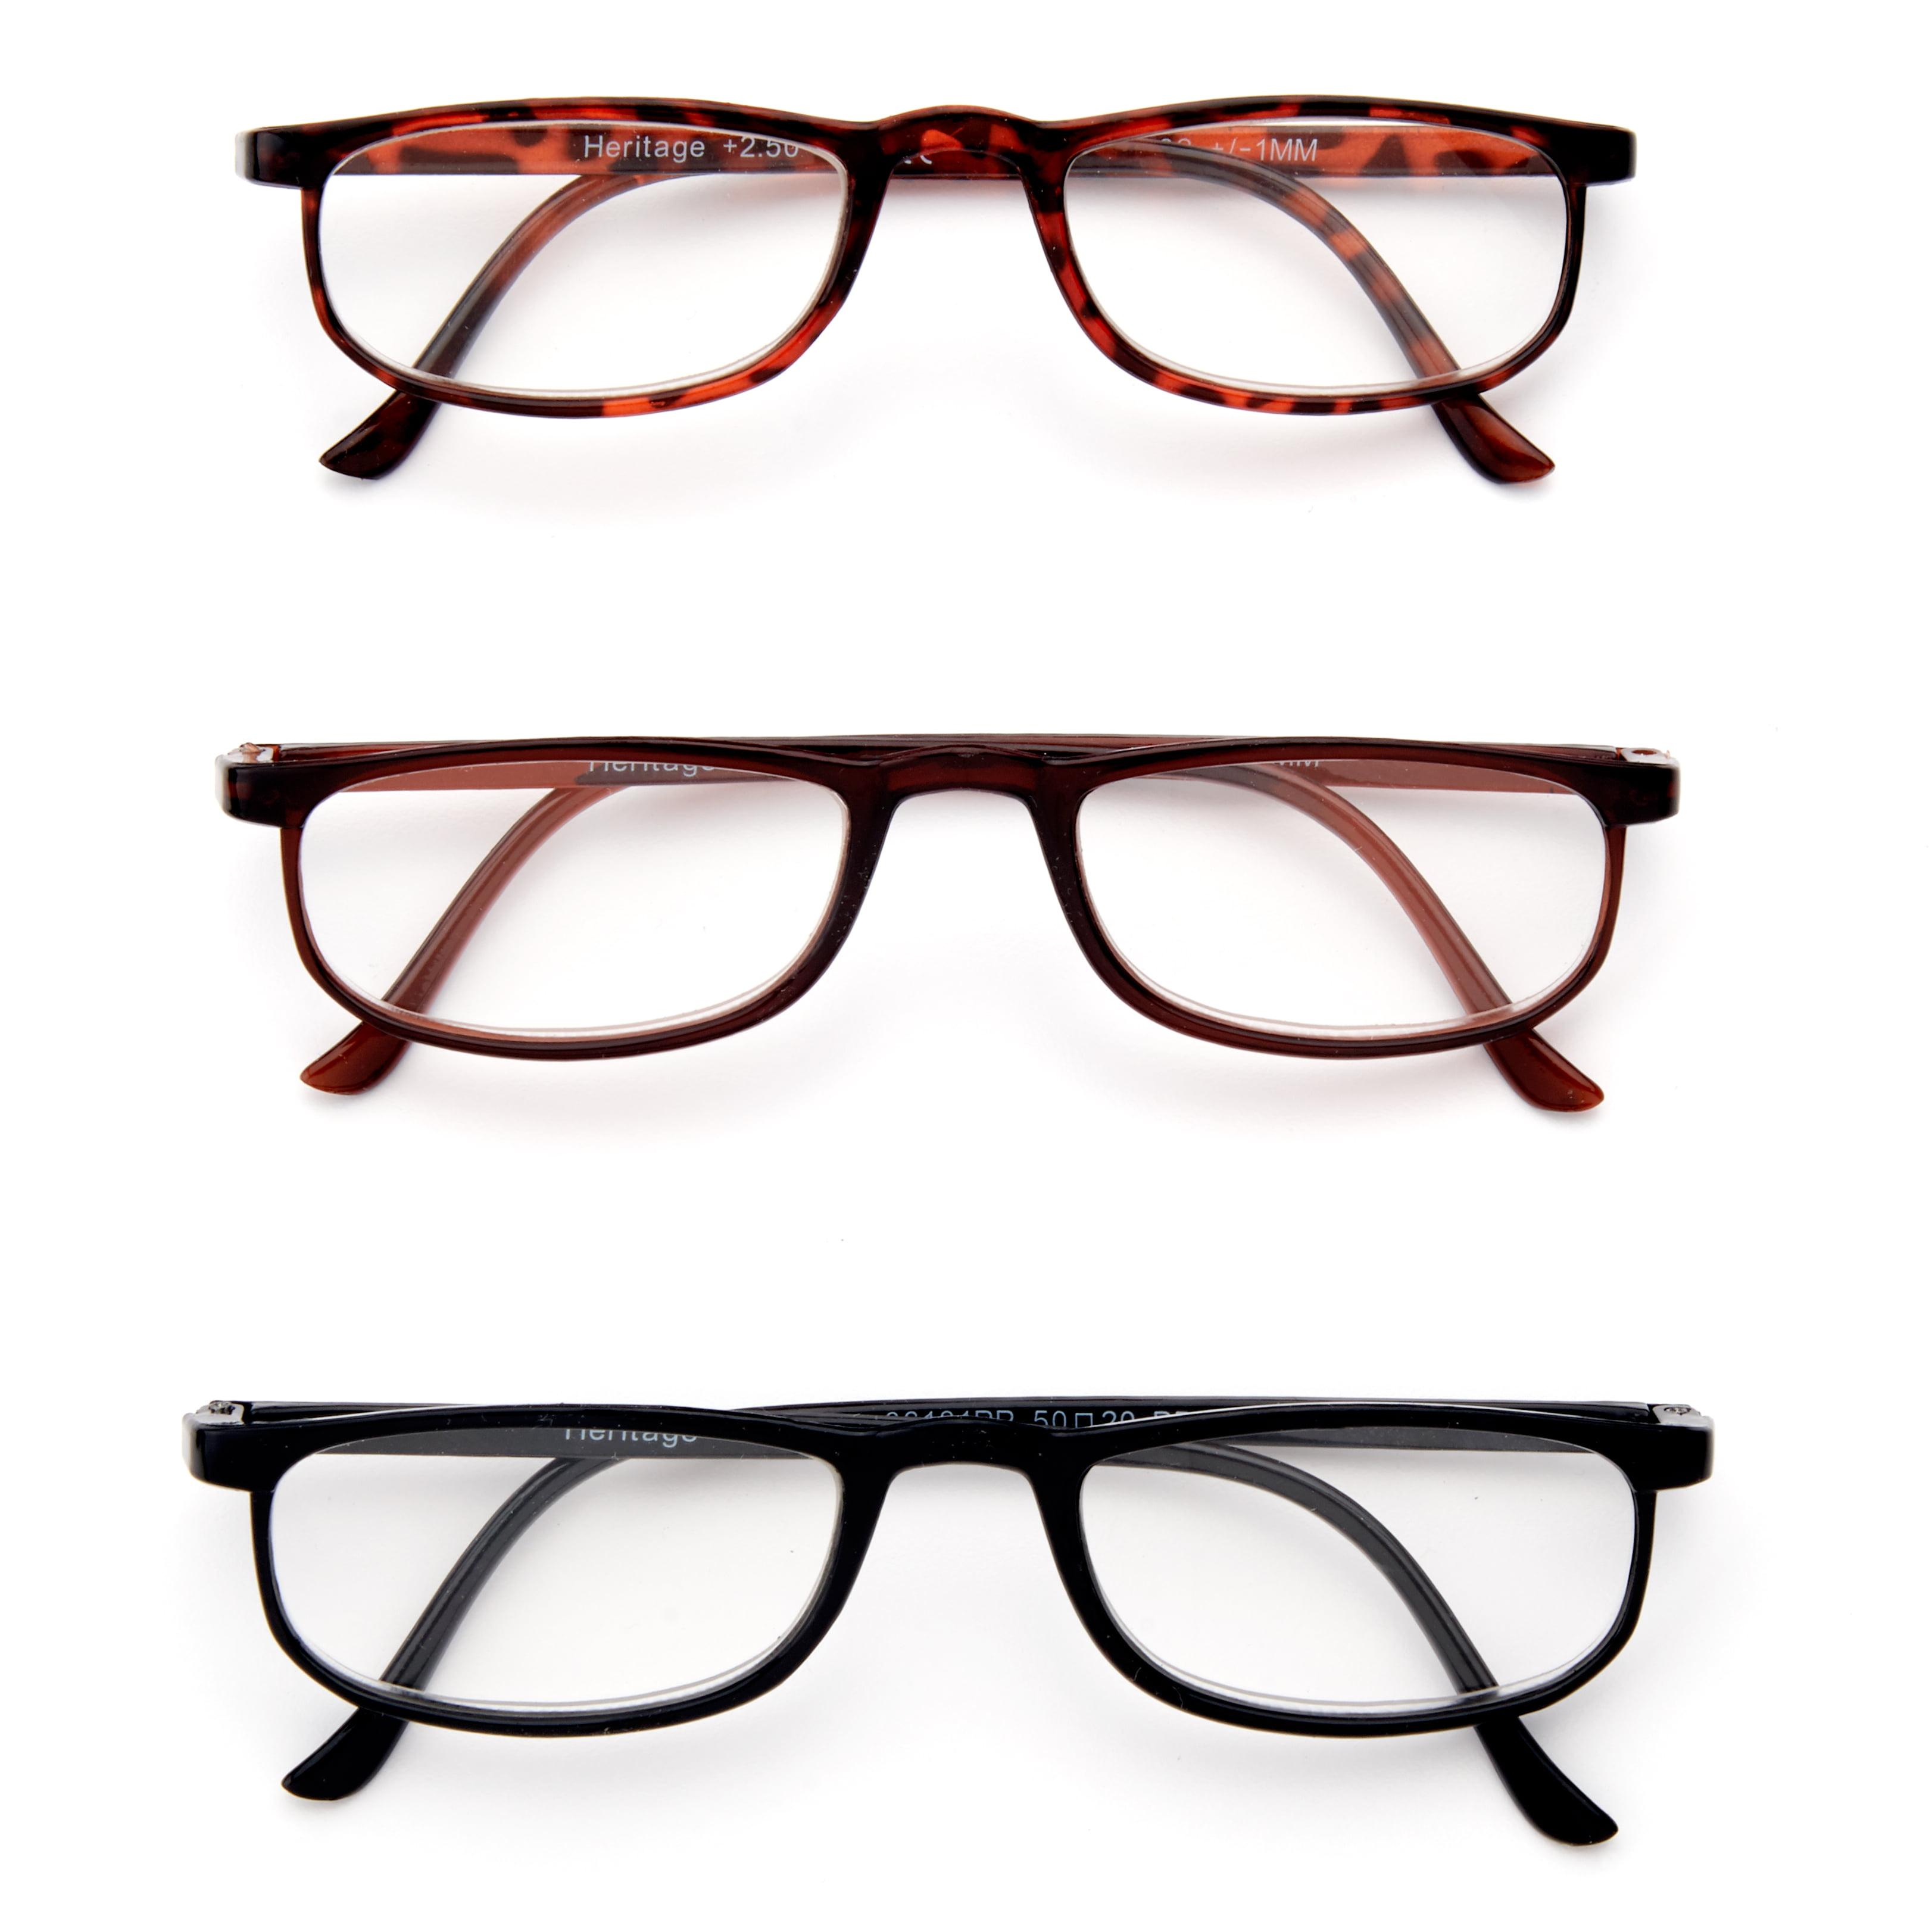 40b781b7b195 Equate Heritage Reading Glasses, +2.50, Assorted Colors, 3 Pack -  Walmart.com